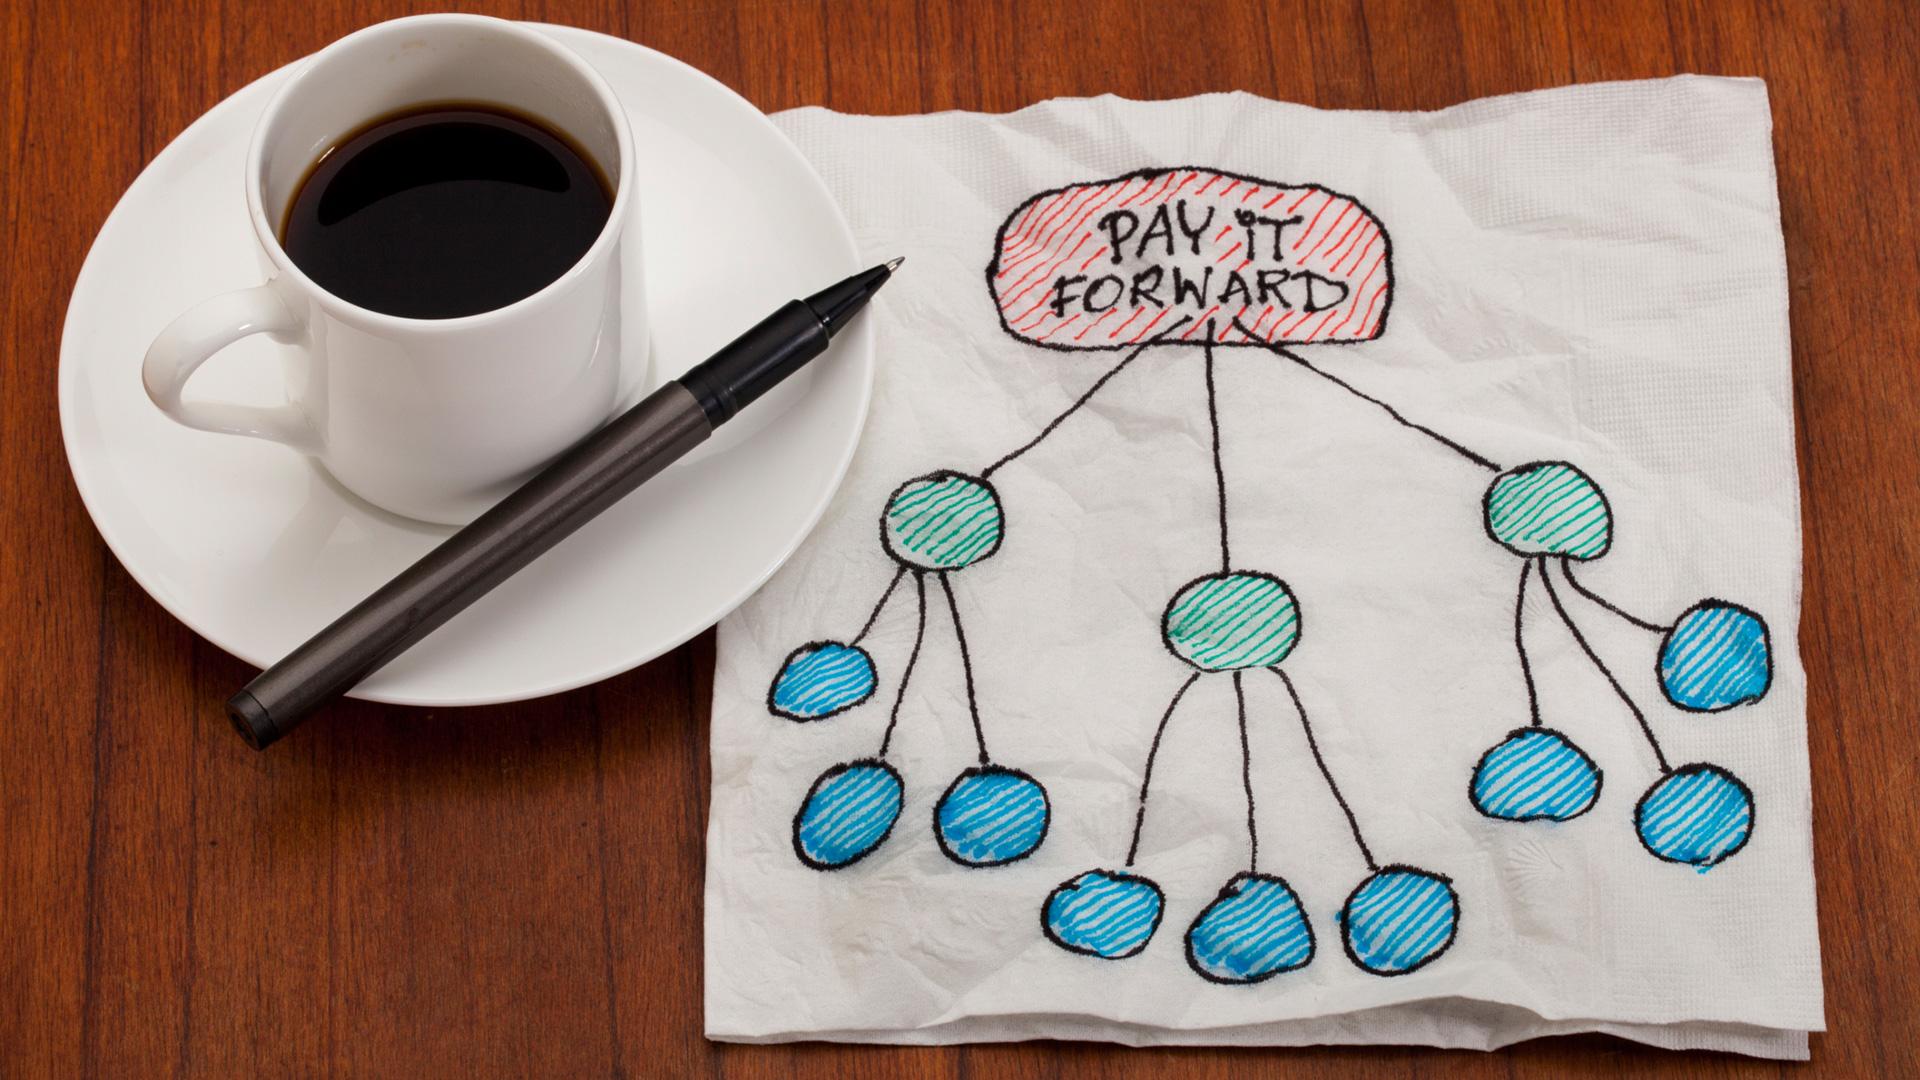 Pay it forward | Sheknows.com